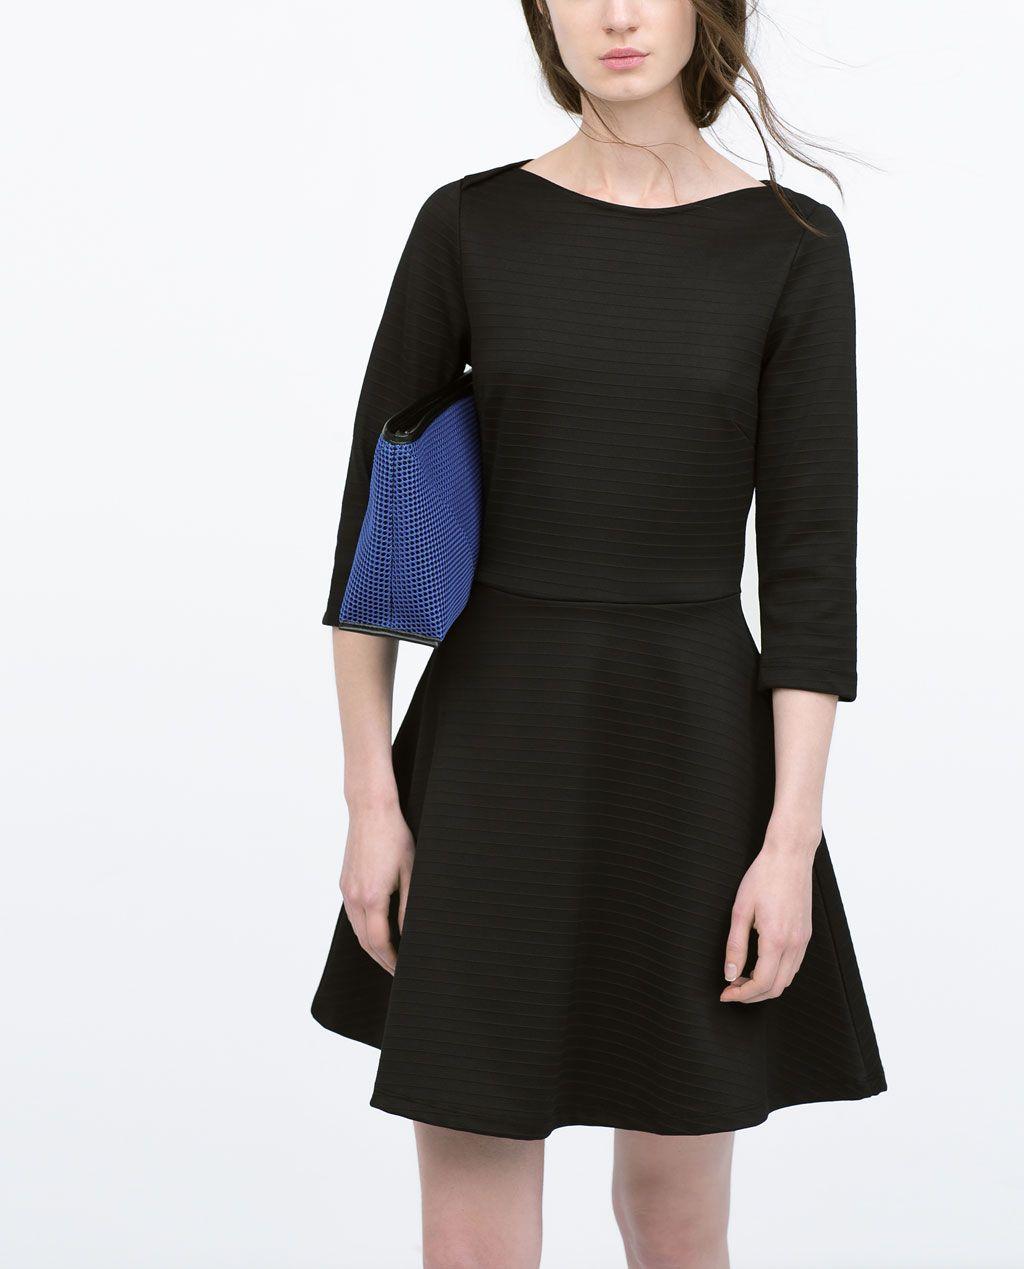 Vestido negro vuelo zara